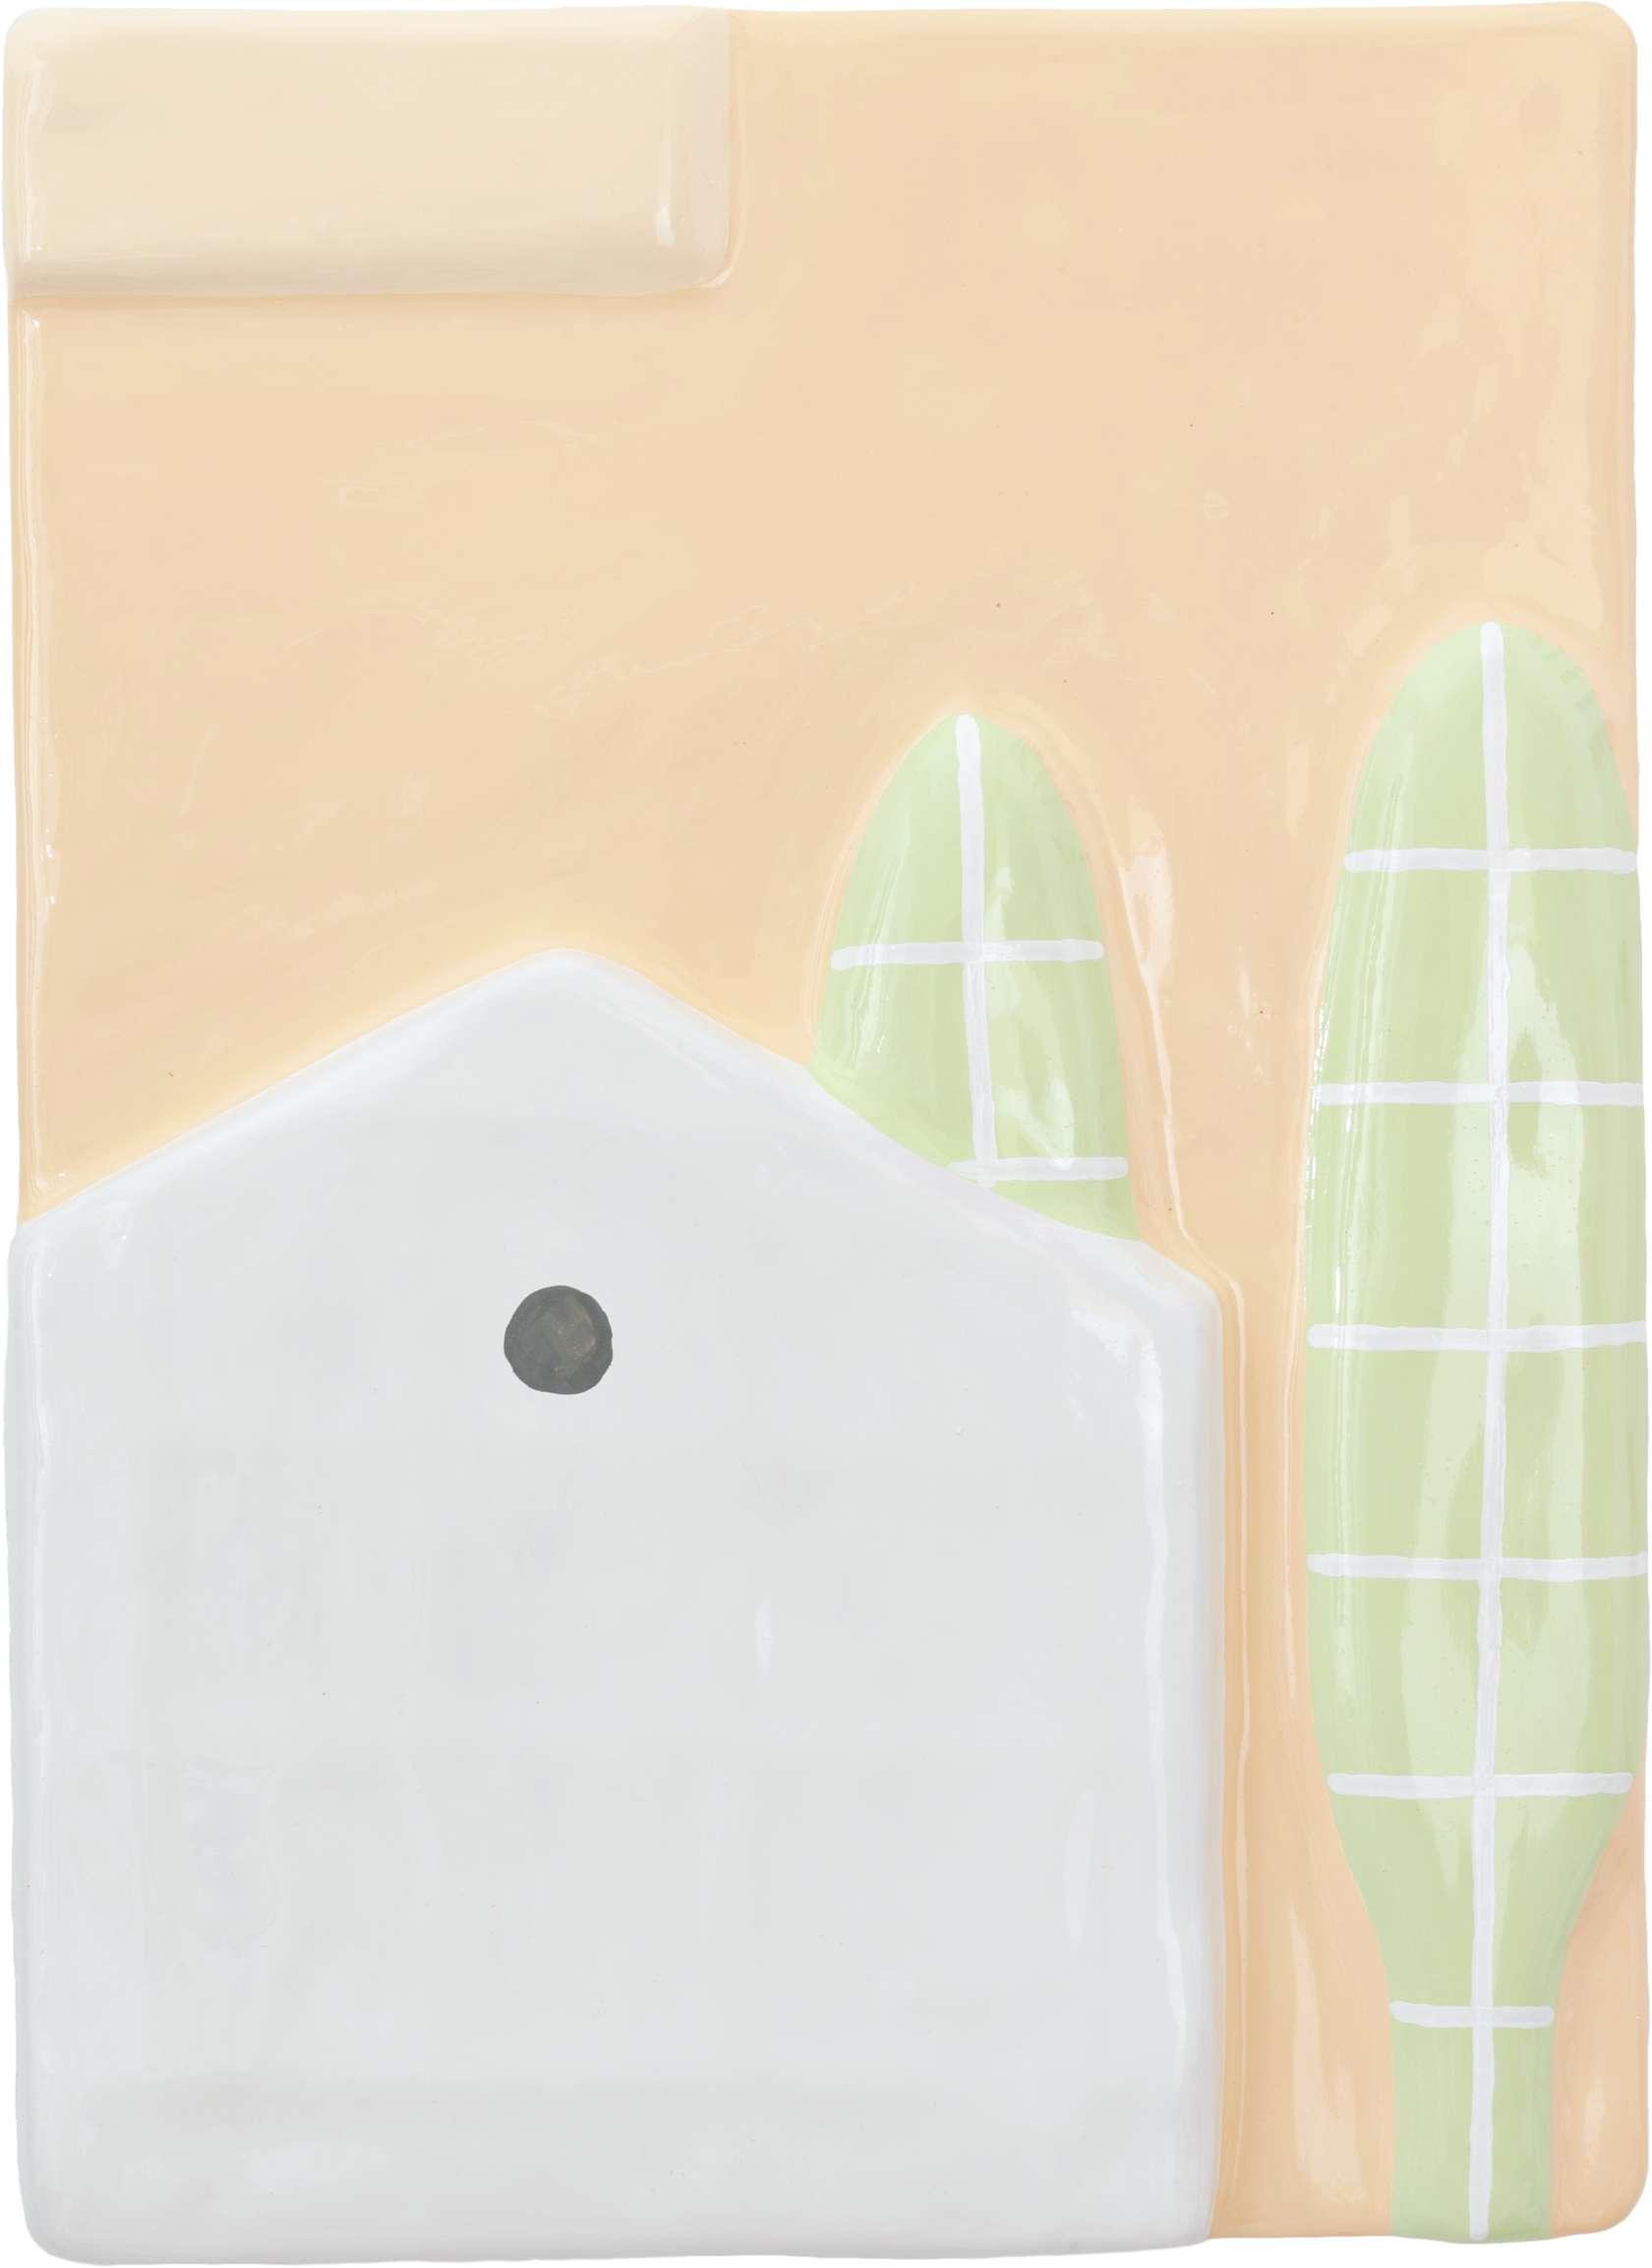 Louis Gary, Ivry, 2019 Polystyrène, bois, plâtre, peinture51 × 37 × 2 cm / 20 1/8 × 14 5/8 × 6/8 in.